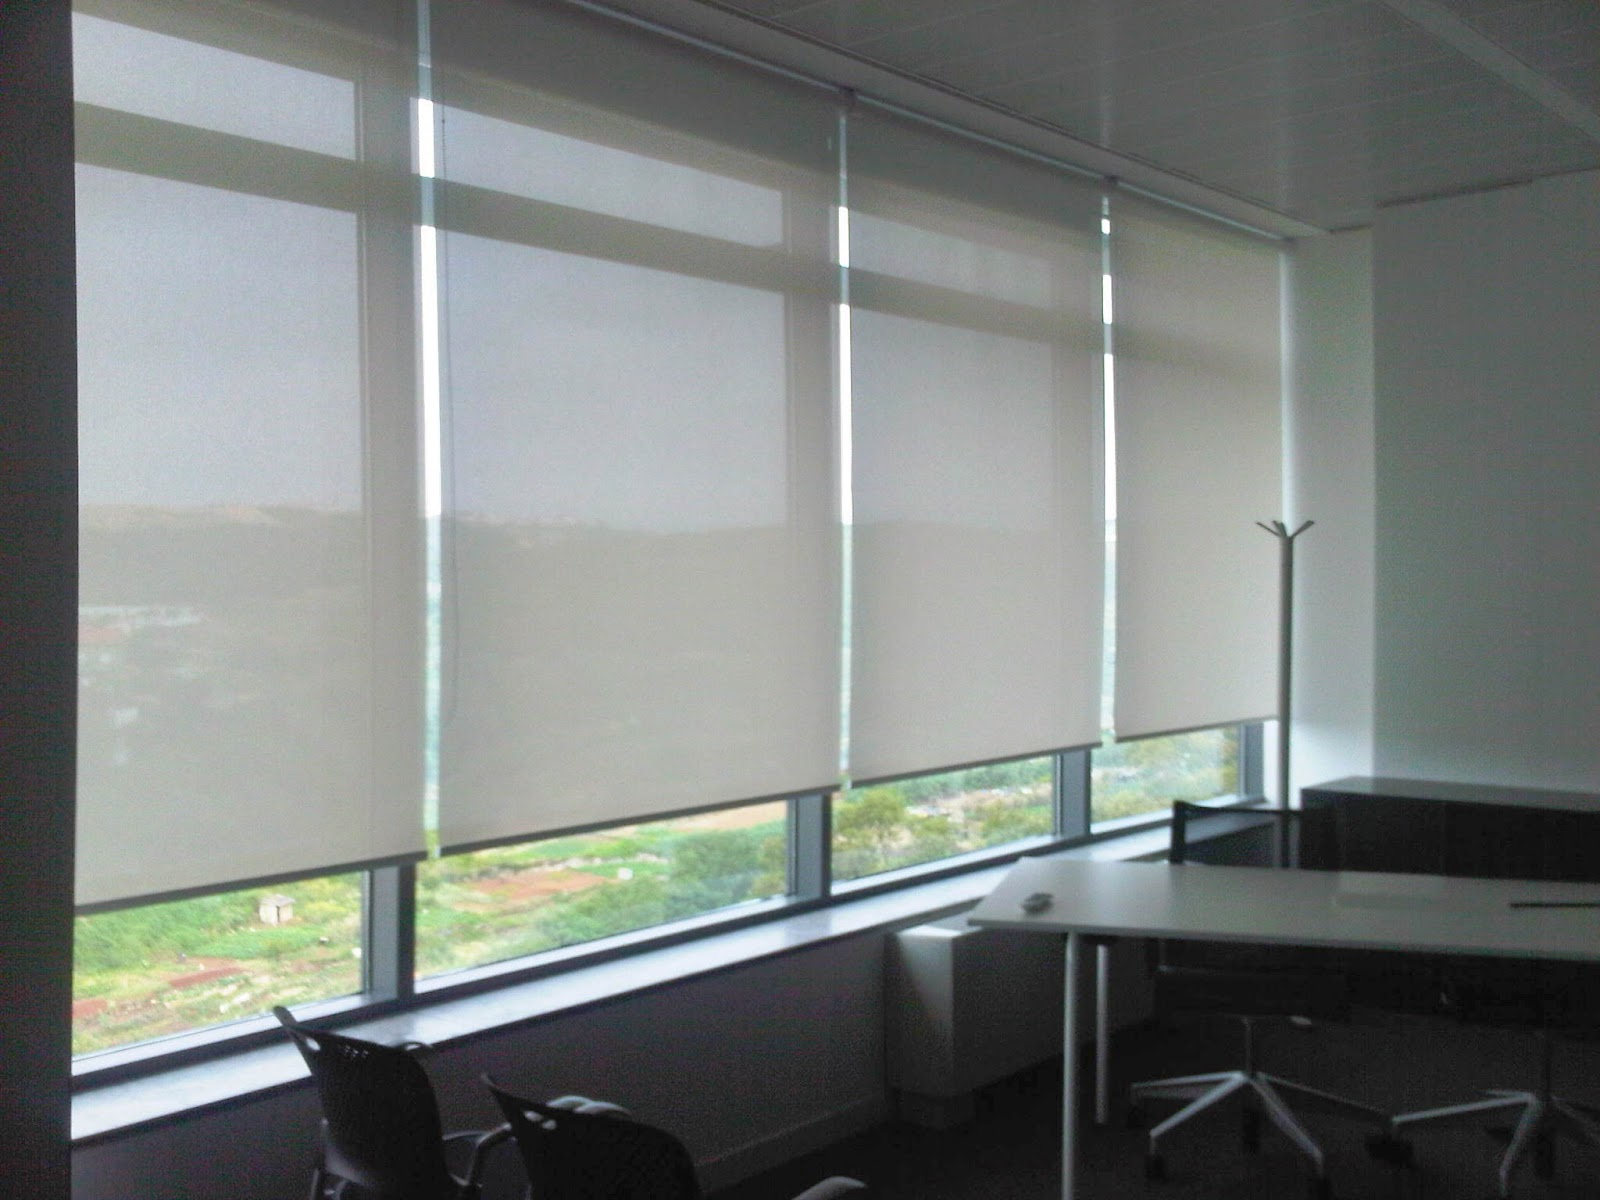 Jnvieira estores projectos interiores maio 2012 - Estores de screen ...